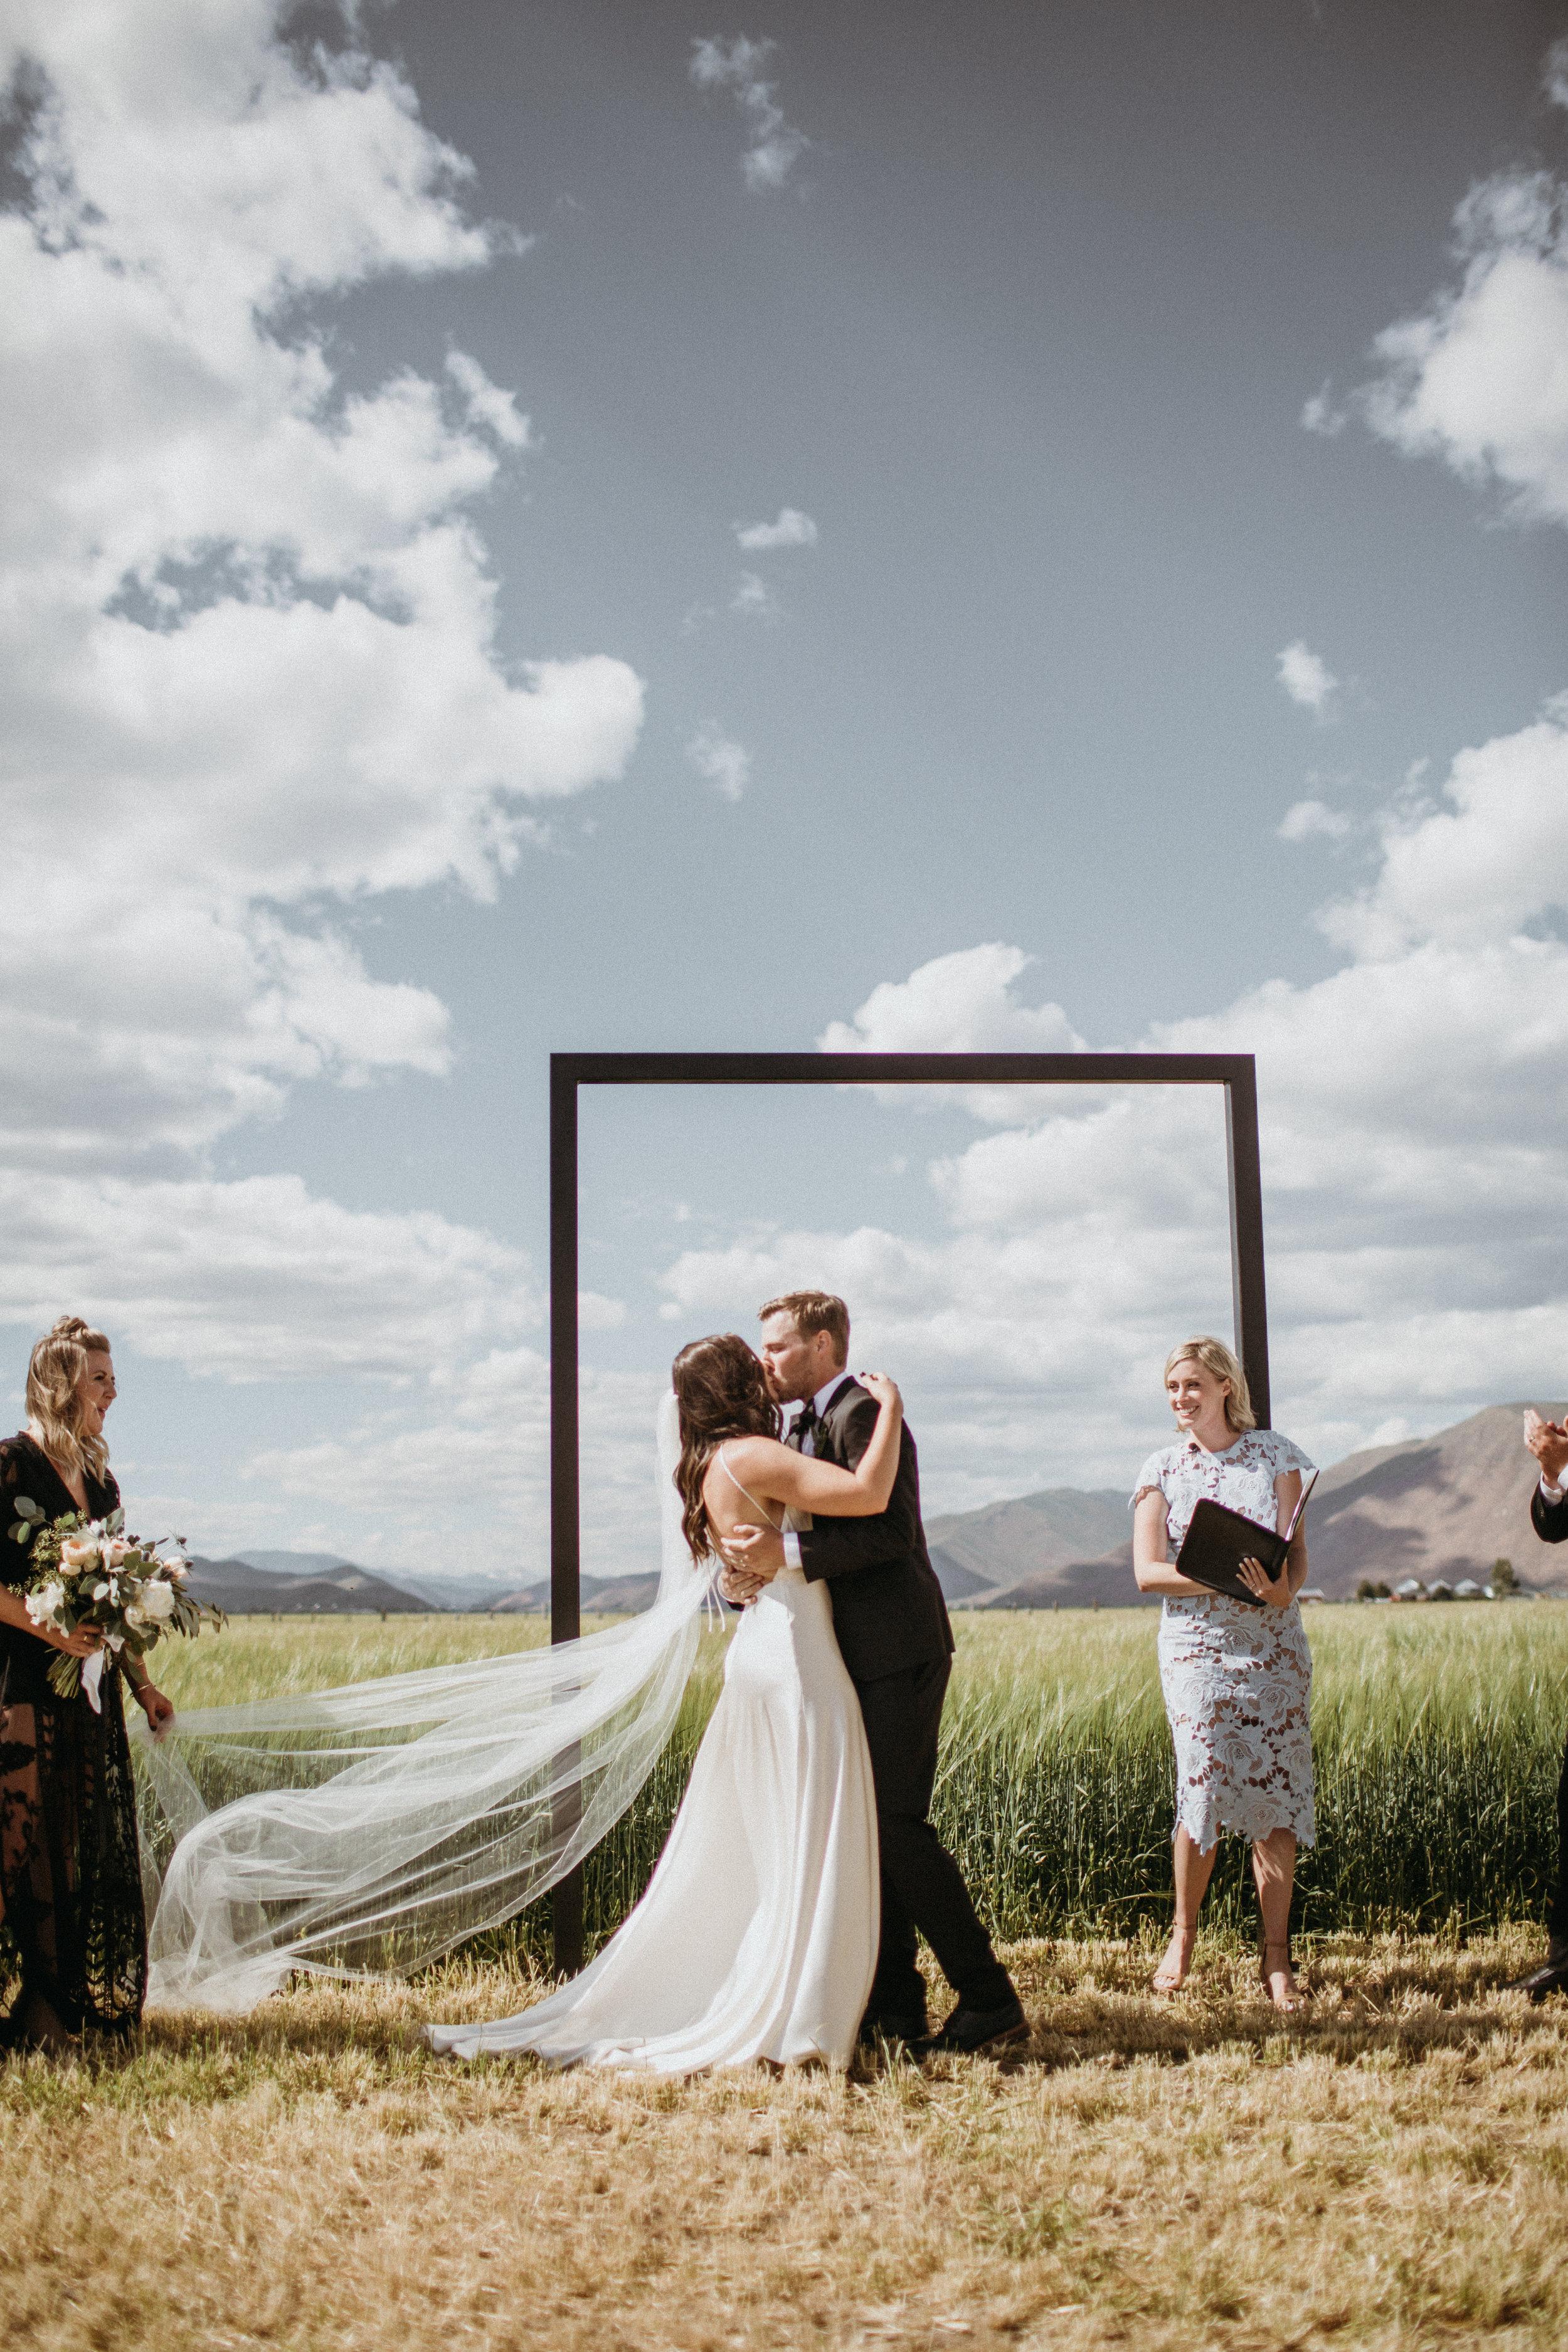 danny_mia_wedding1-124.jpg